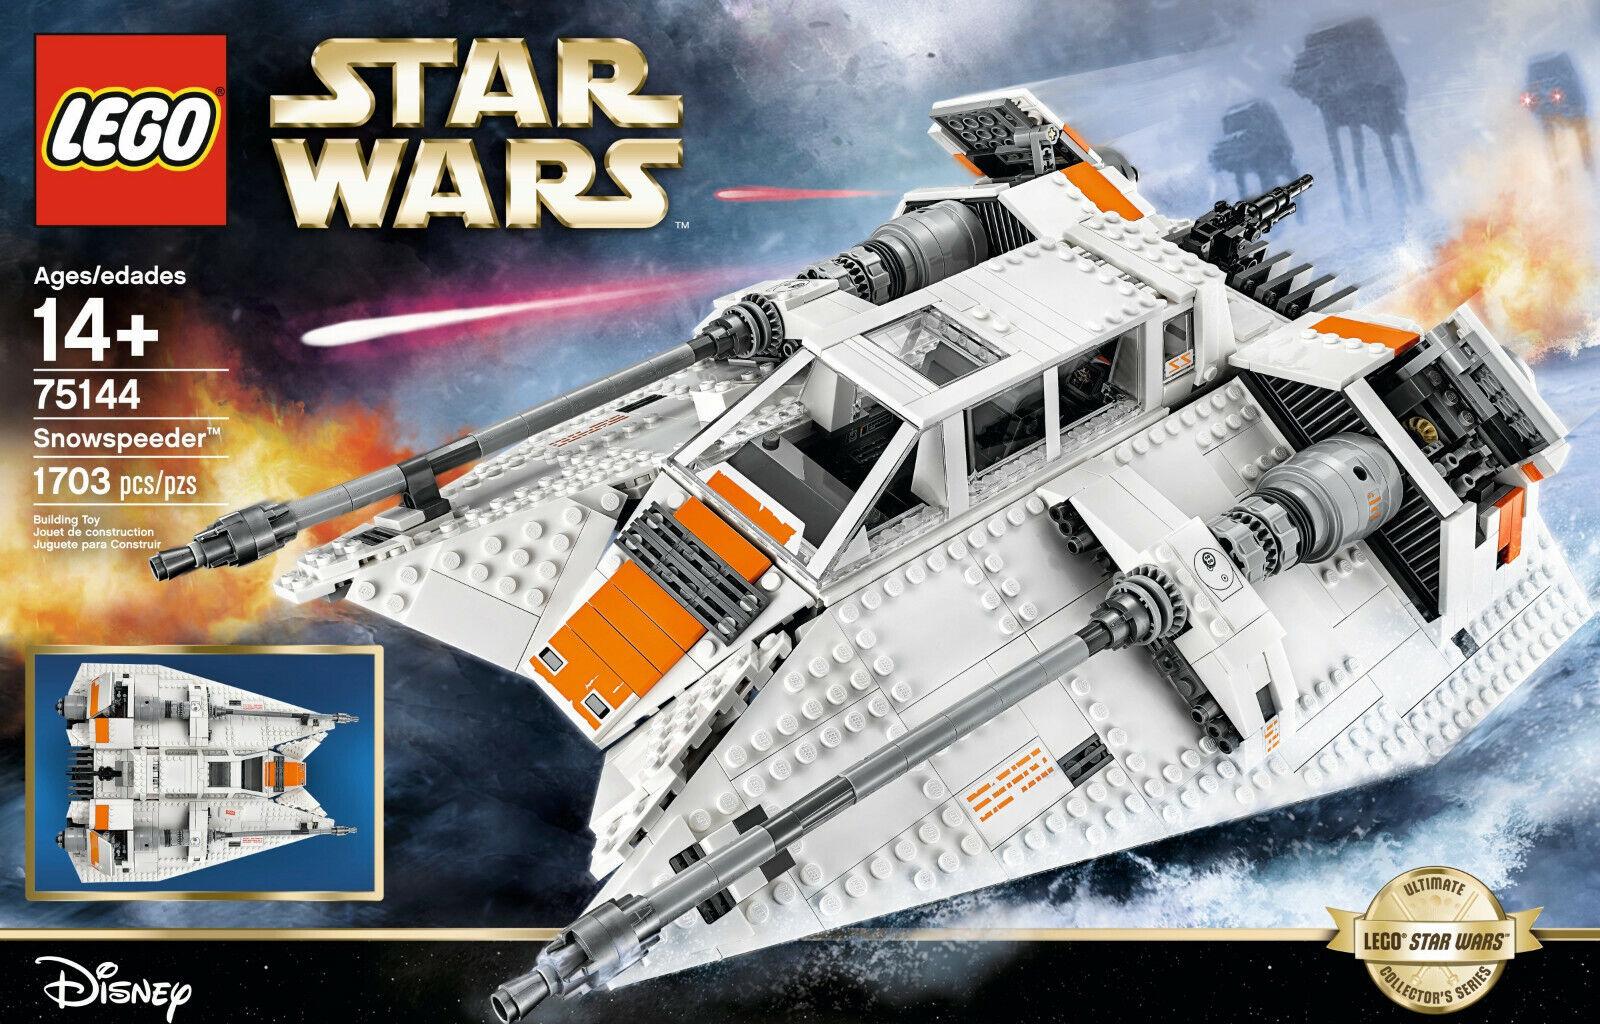 LEGO STAR WARS UCS SNOWSPEEDER (75144) ULTIMATE COLLECTORS SERIES - NEW NISB